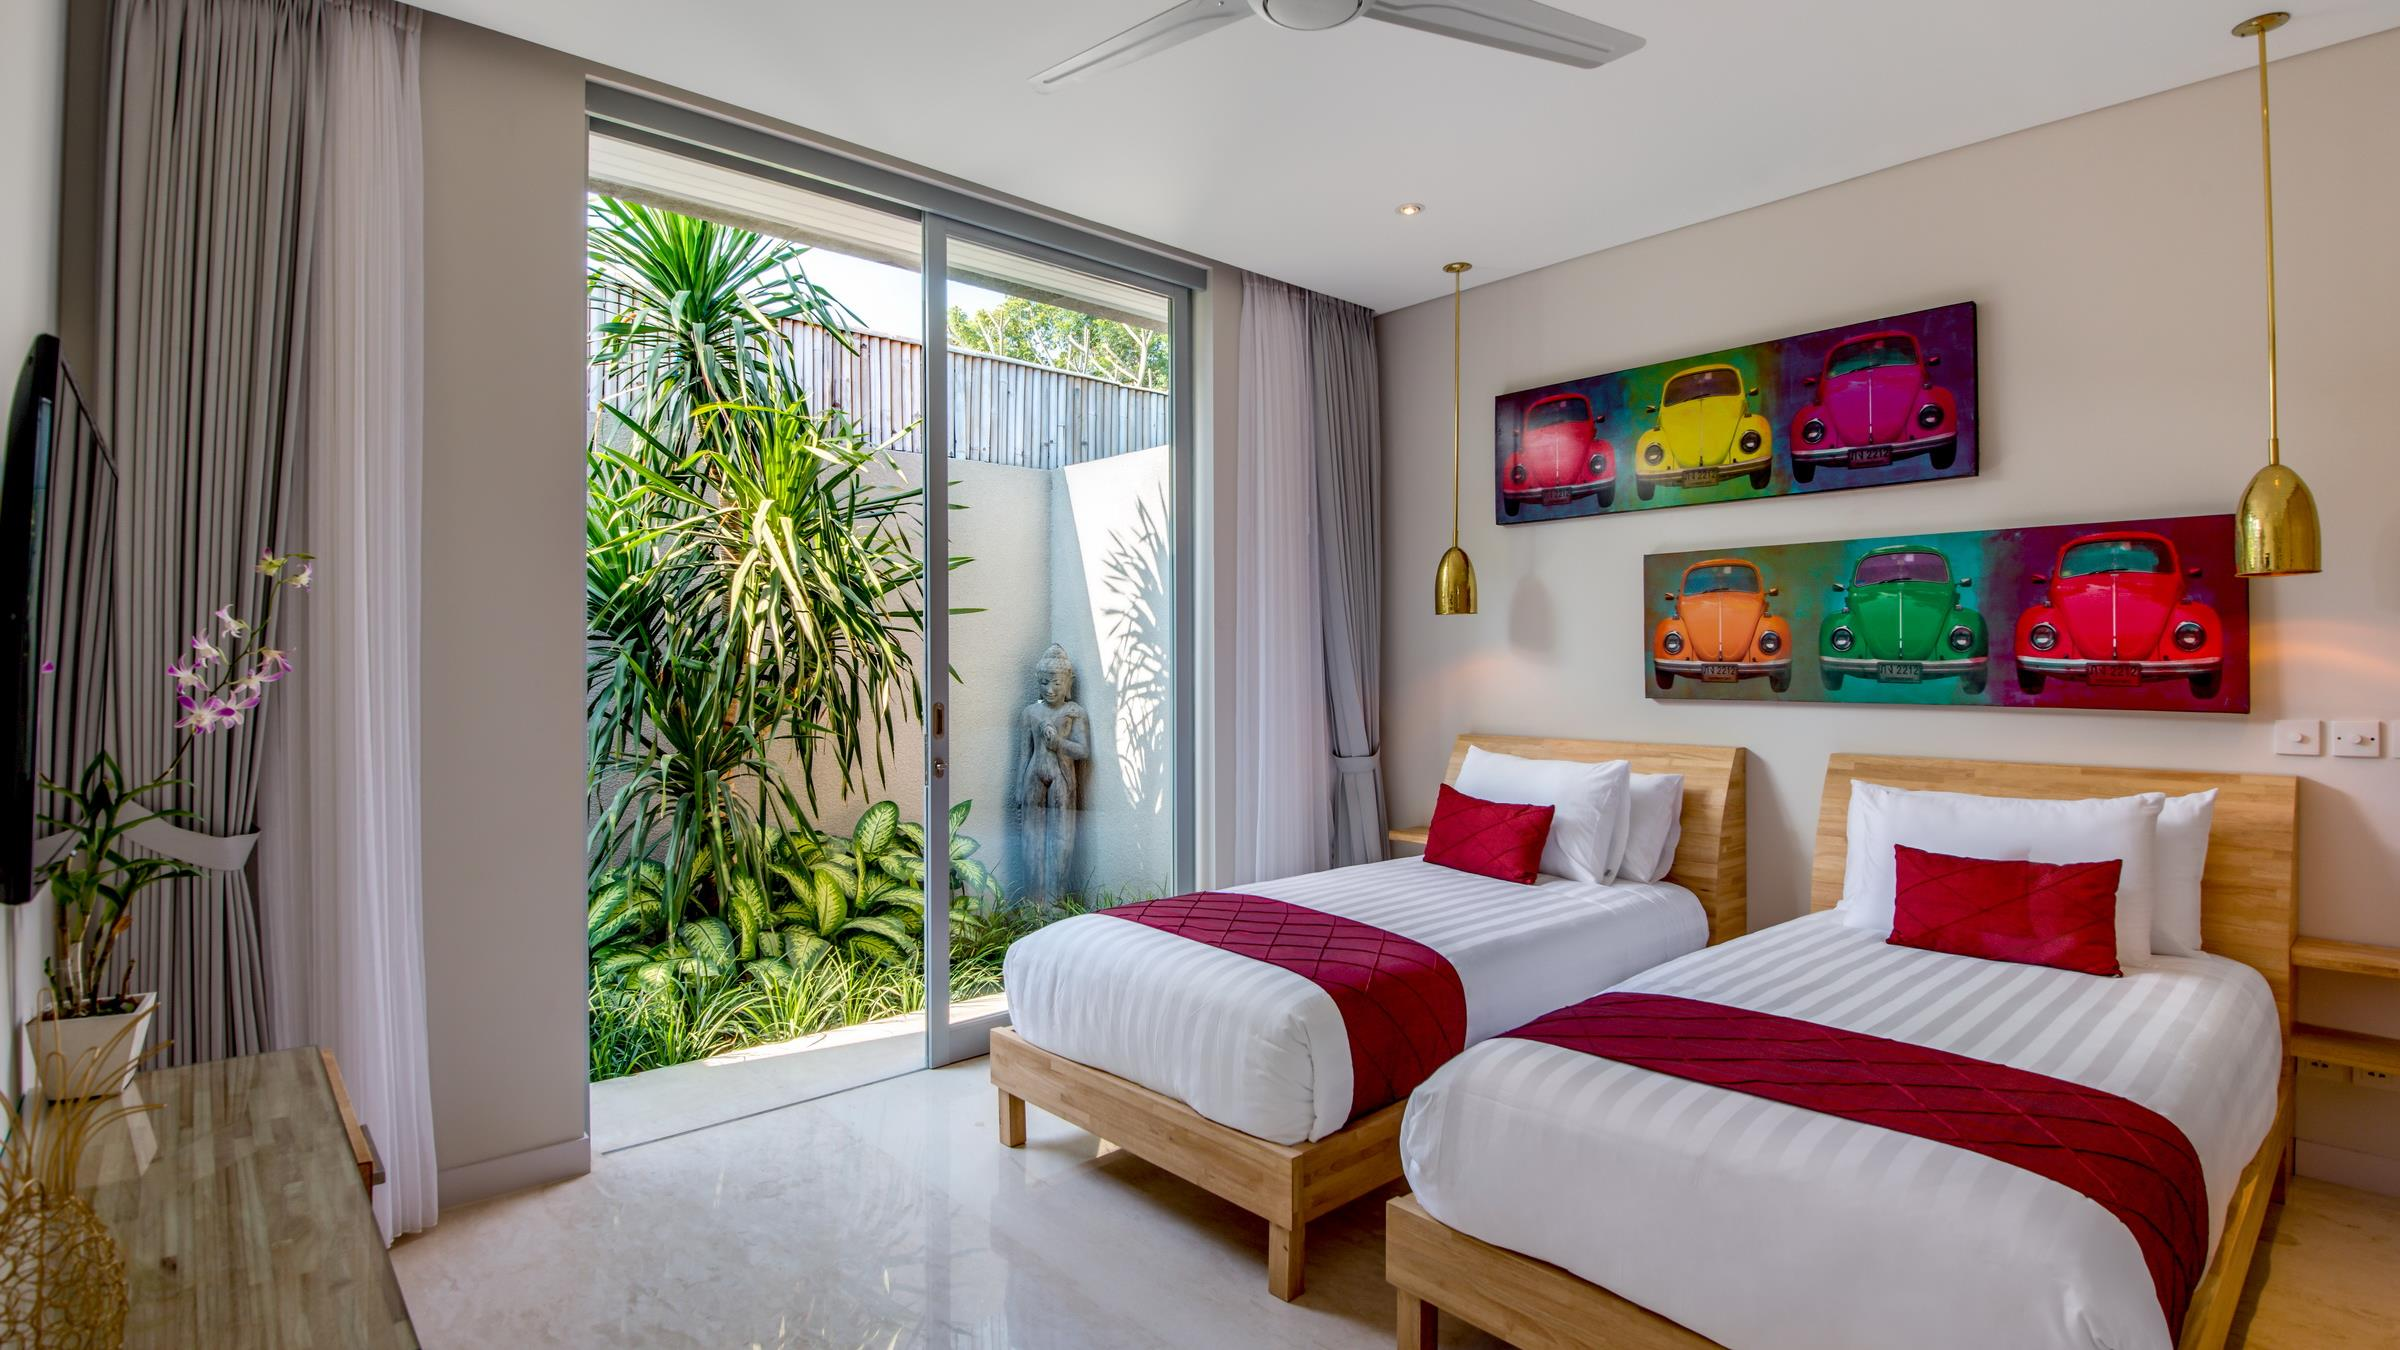 Twin Bedroom with View - Villa Bamboo Aramanis - Seminyak, Bali